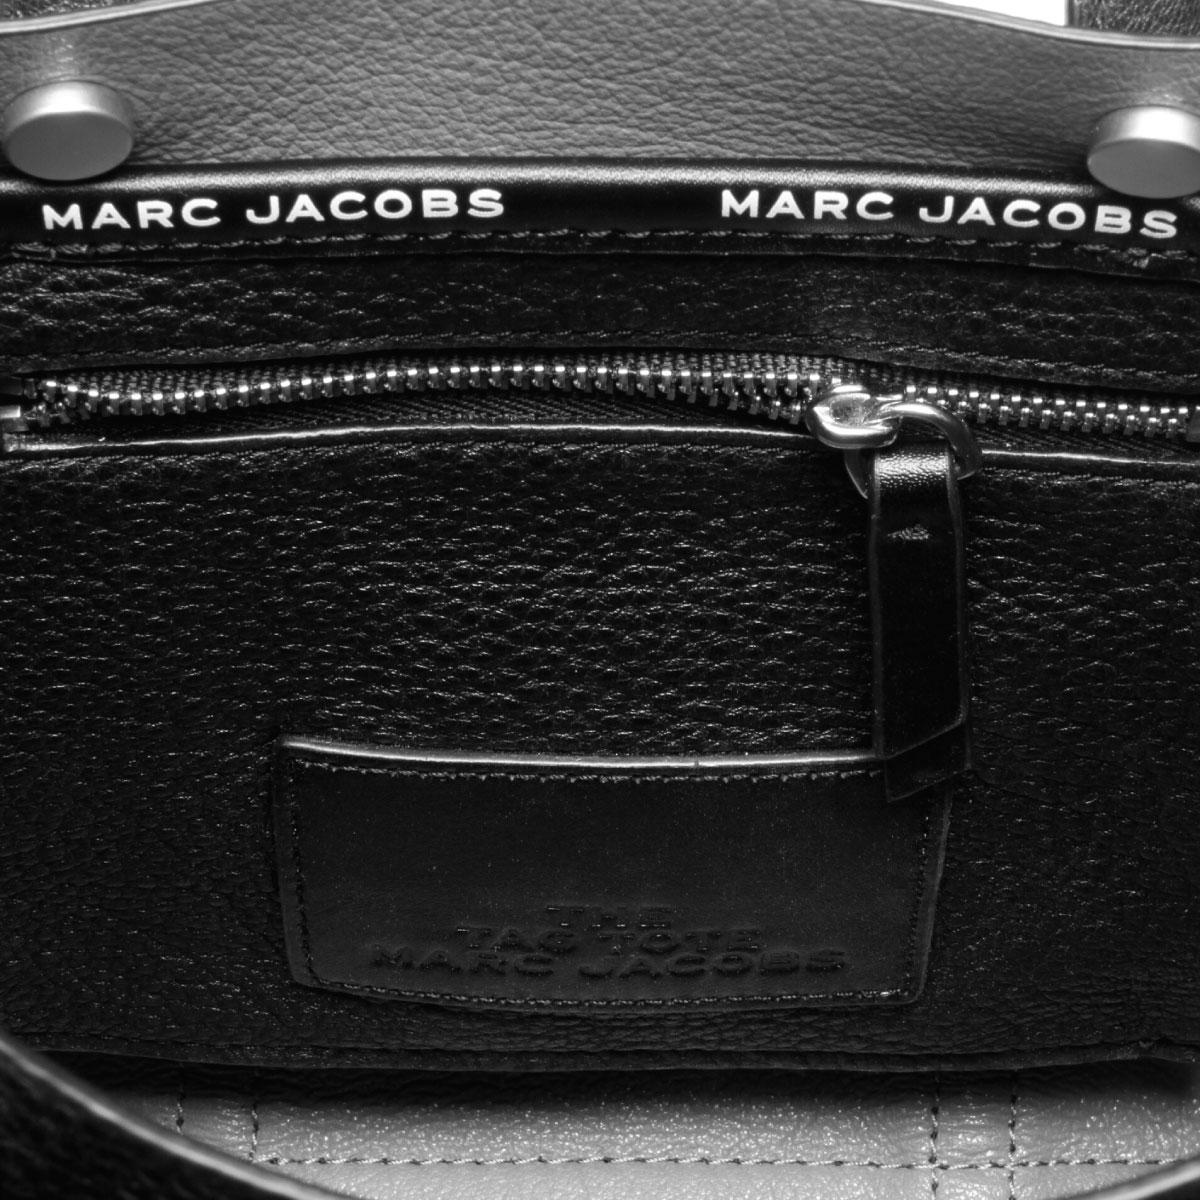 MARC JACOBS マーク ジェイコブス | ショルダー付 トートバッグ | THE TAG 21 ザ タグ 21